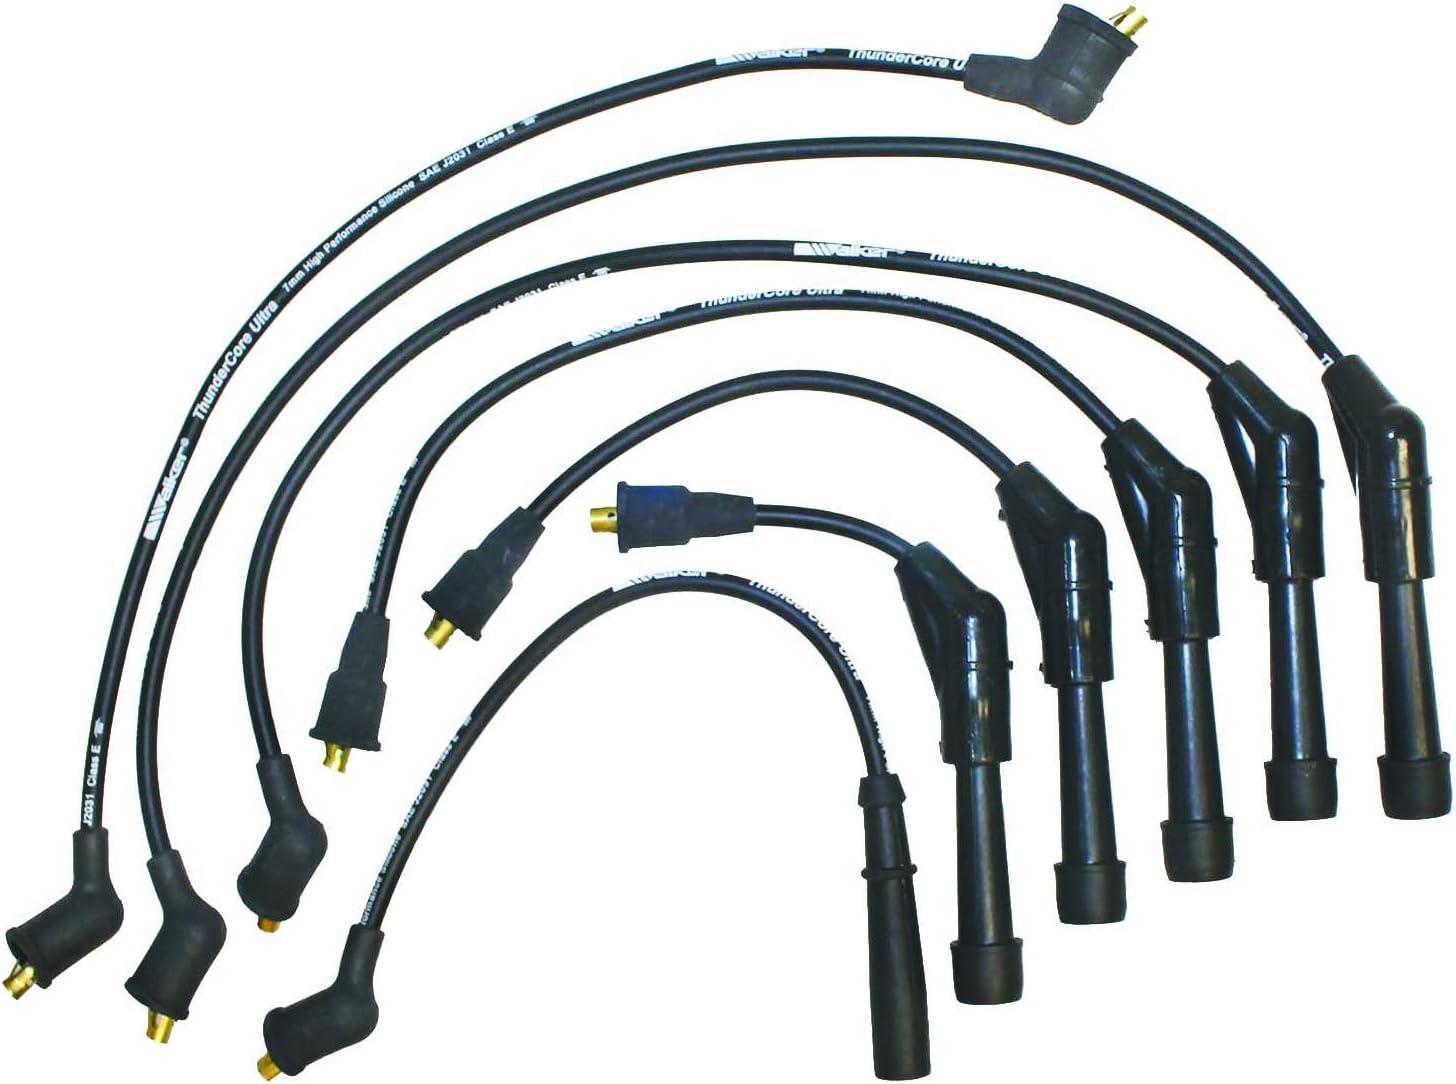 Walker Products 900-1277 Luxury Max 81% OFF Premium Set Spark Plug Wire